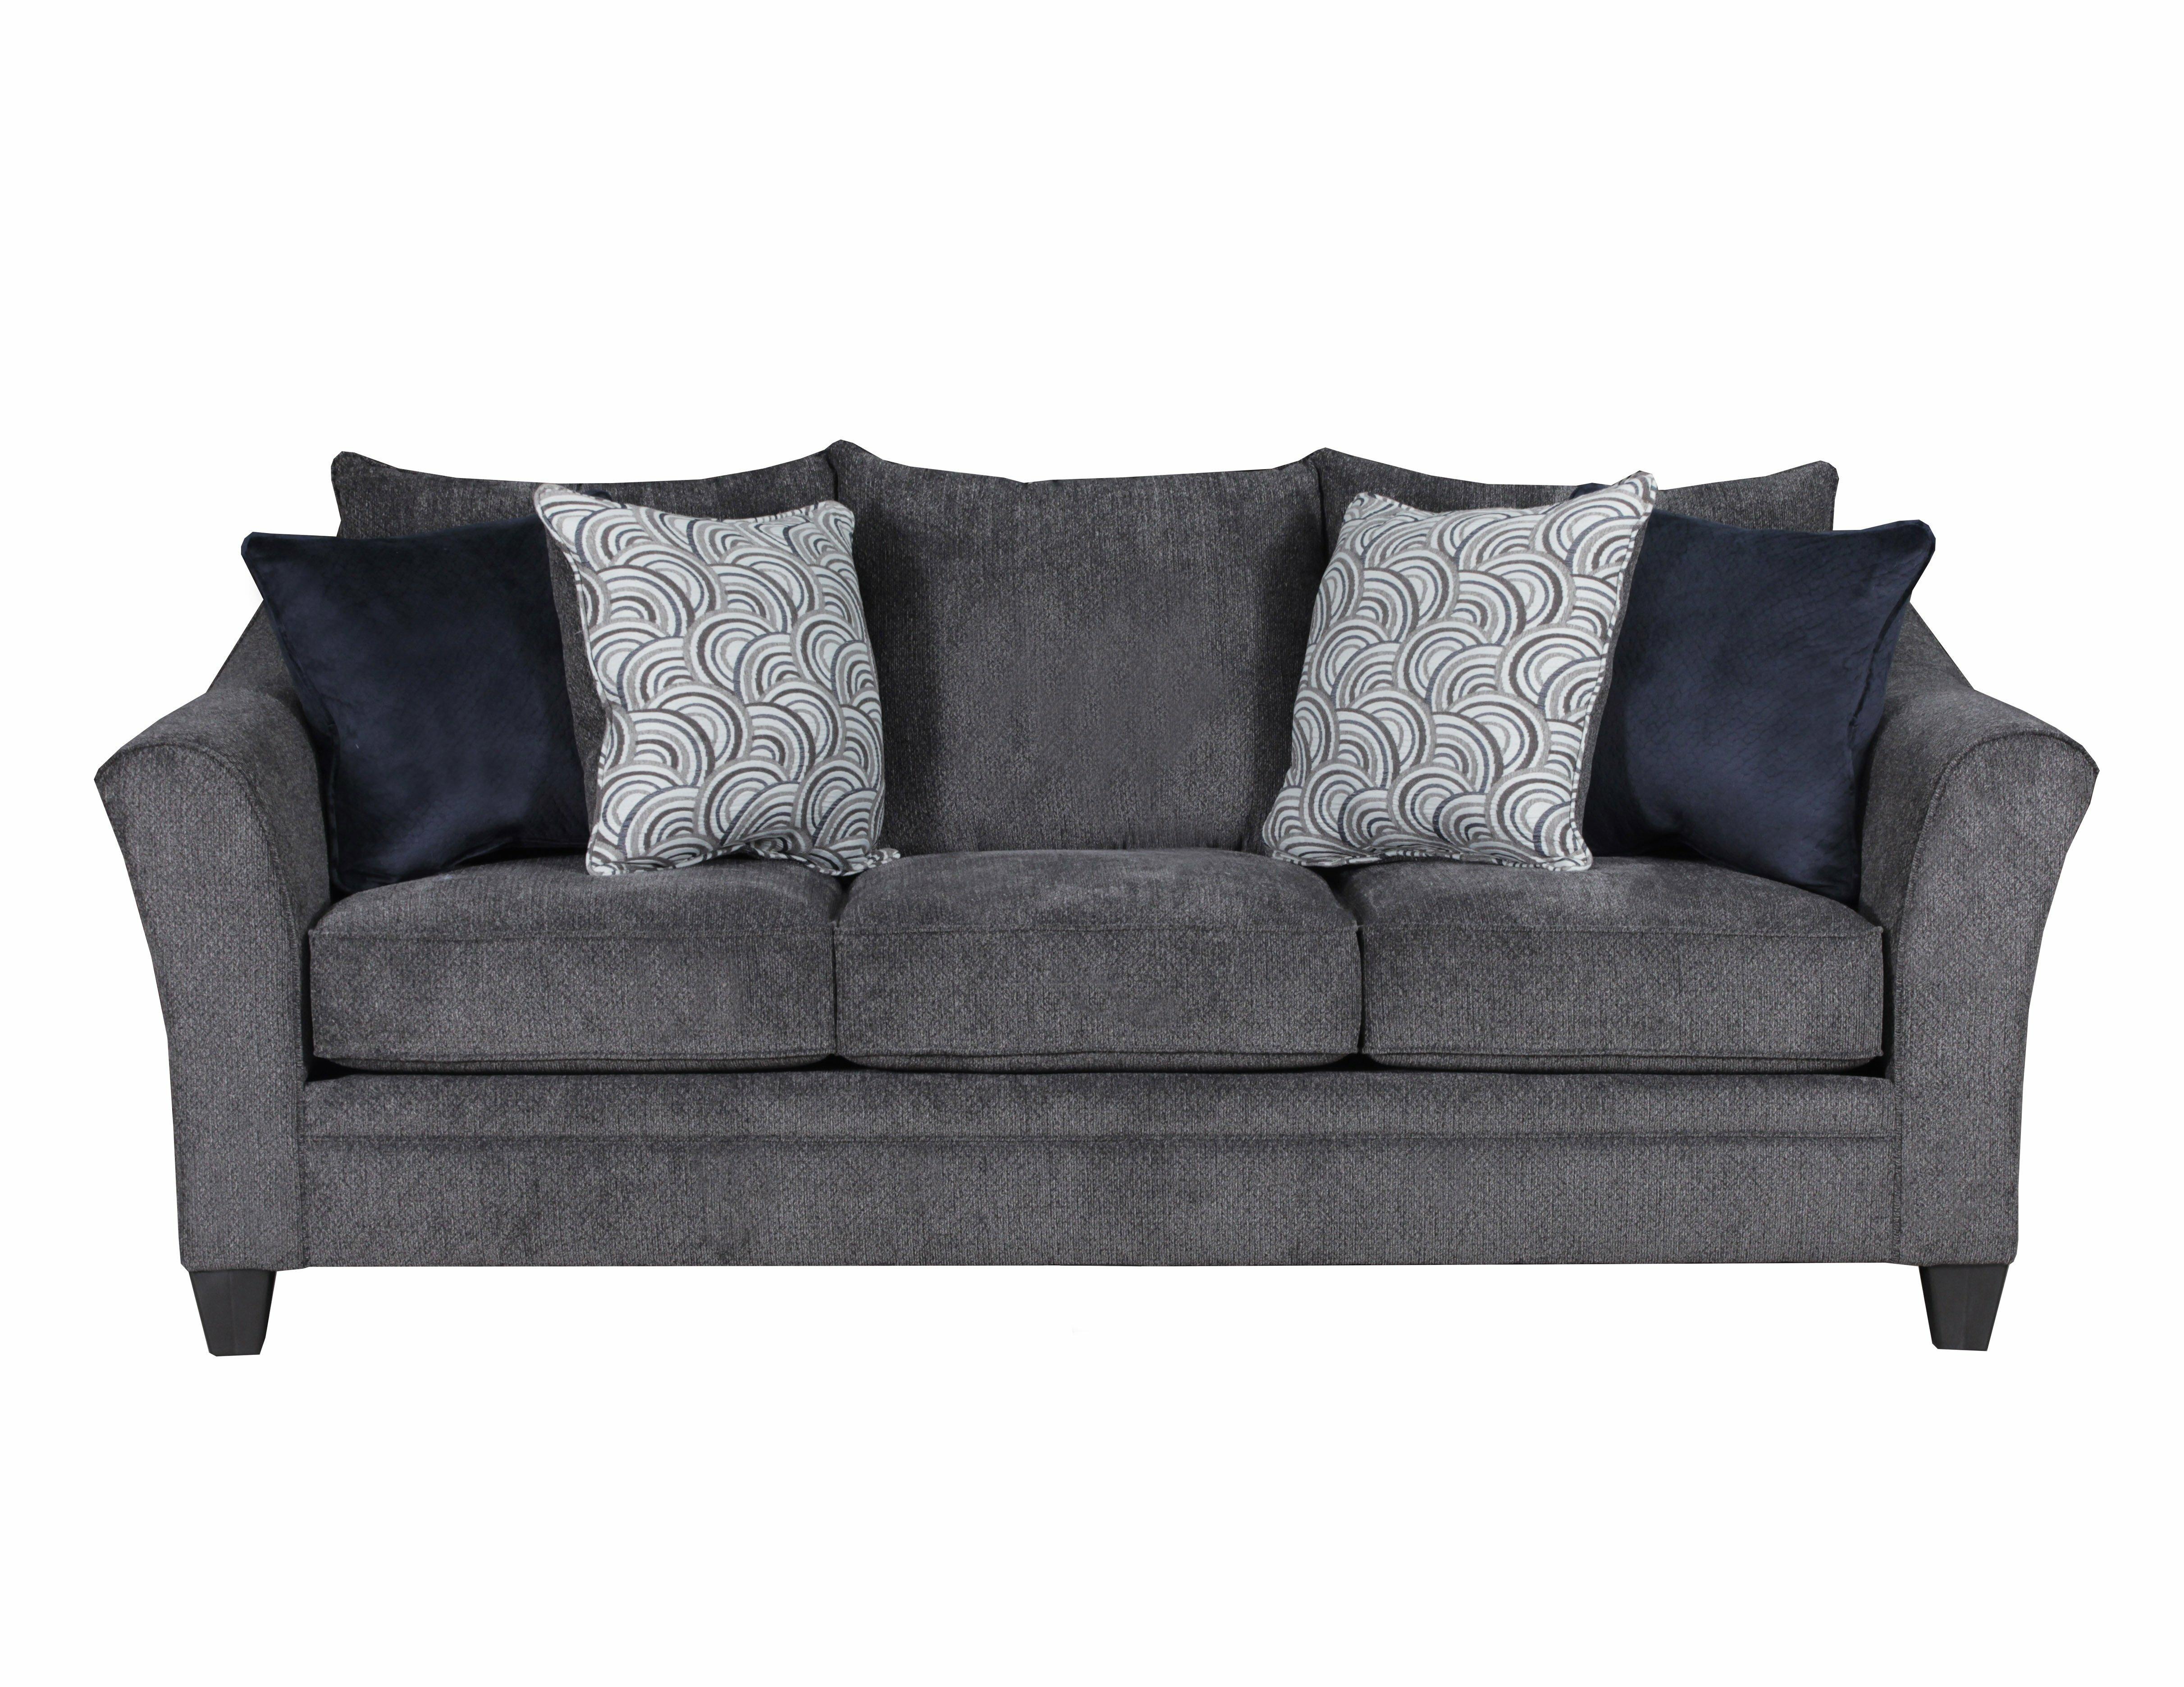 simmons living room furniture. Simmons Living Room Furniture I